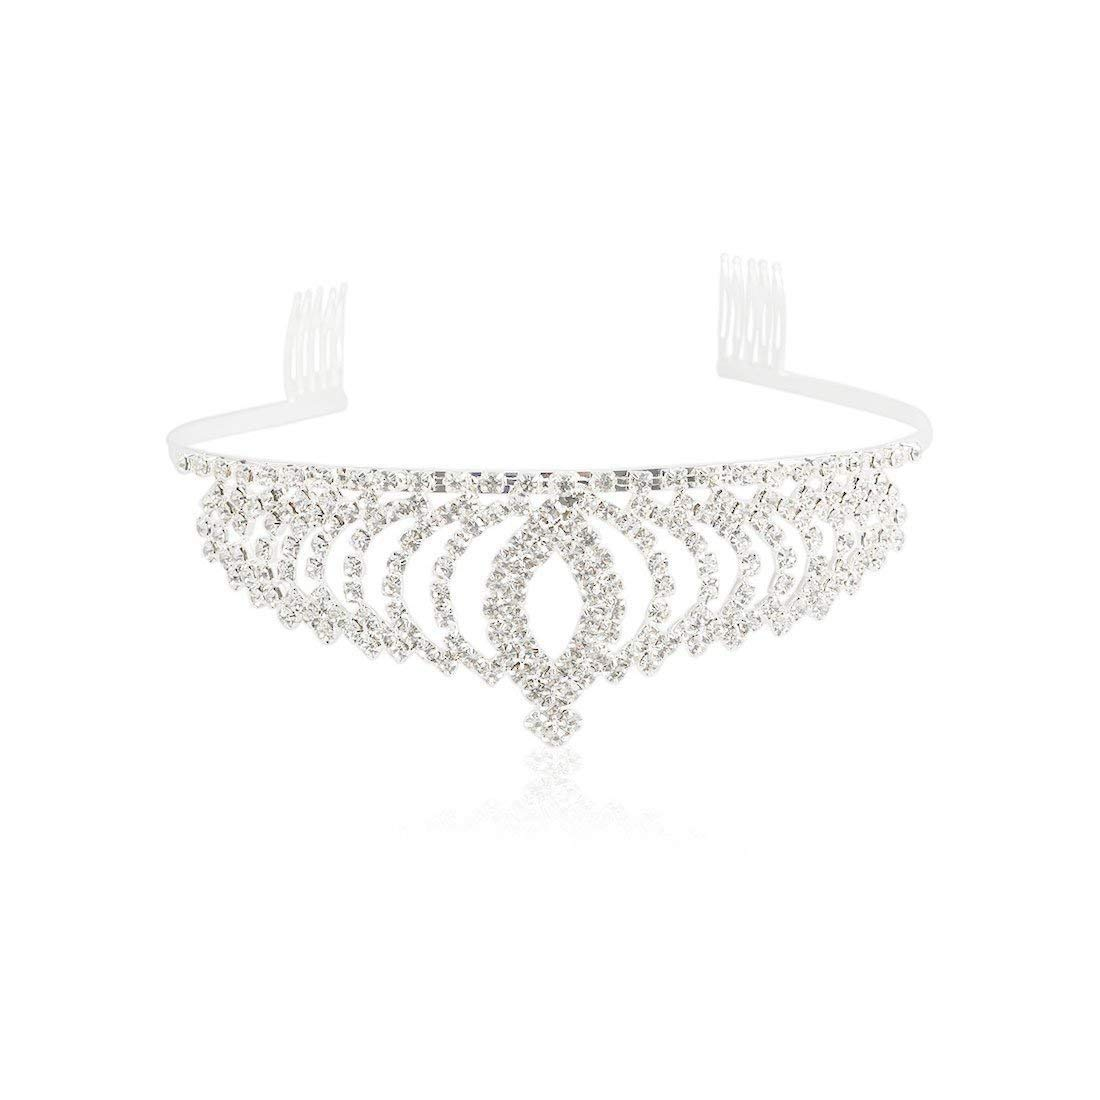 SODIAL Fashion Royal Bridal Princess Tiara Crown Hair Comb Hair Jewelry for Women Girls 170767